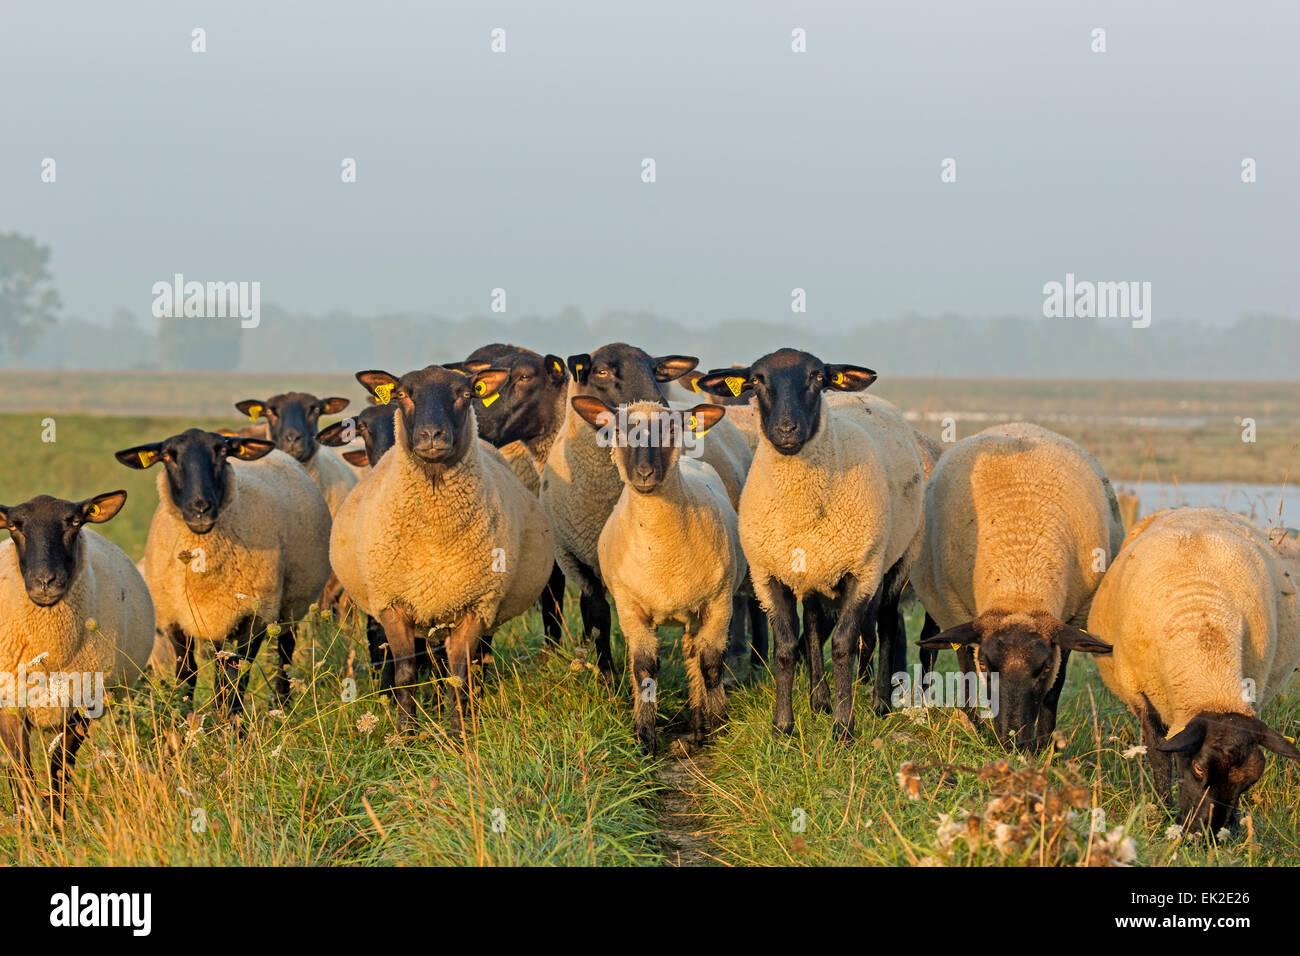 Domestic sheep / Ovis orientalis aries - Stock Image